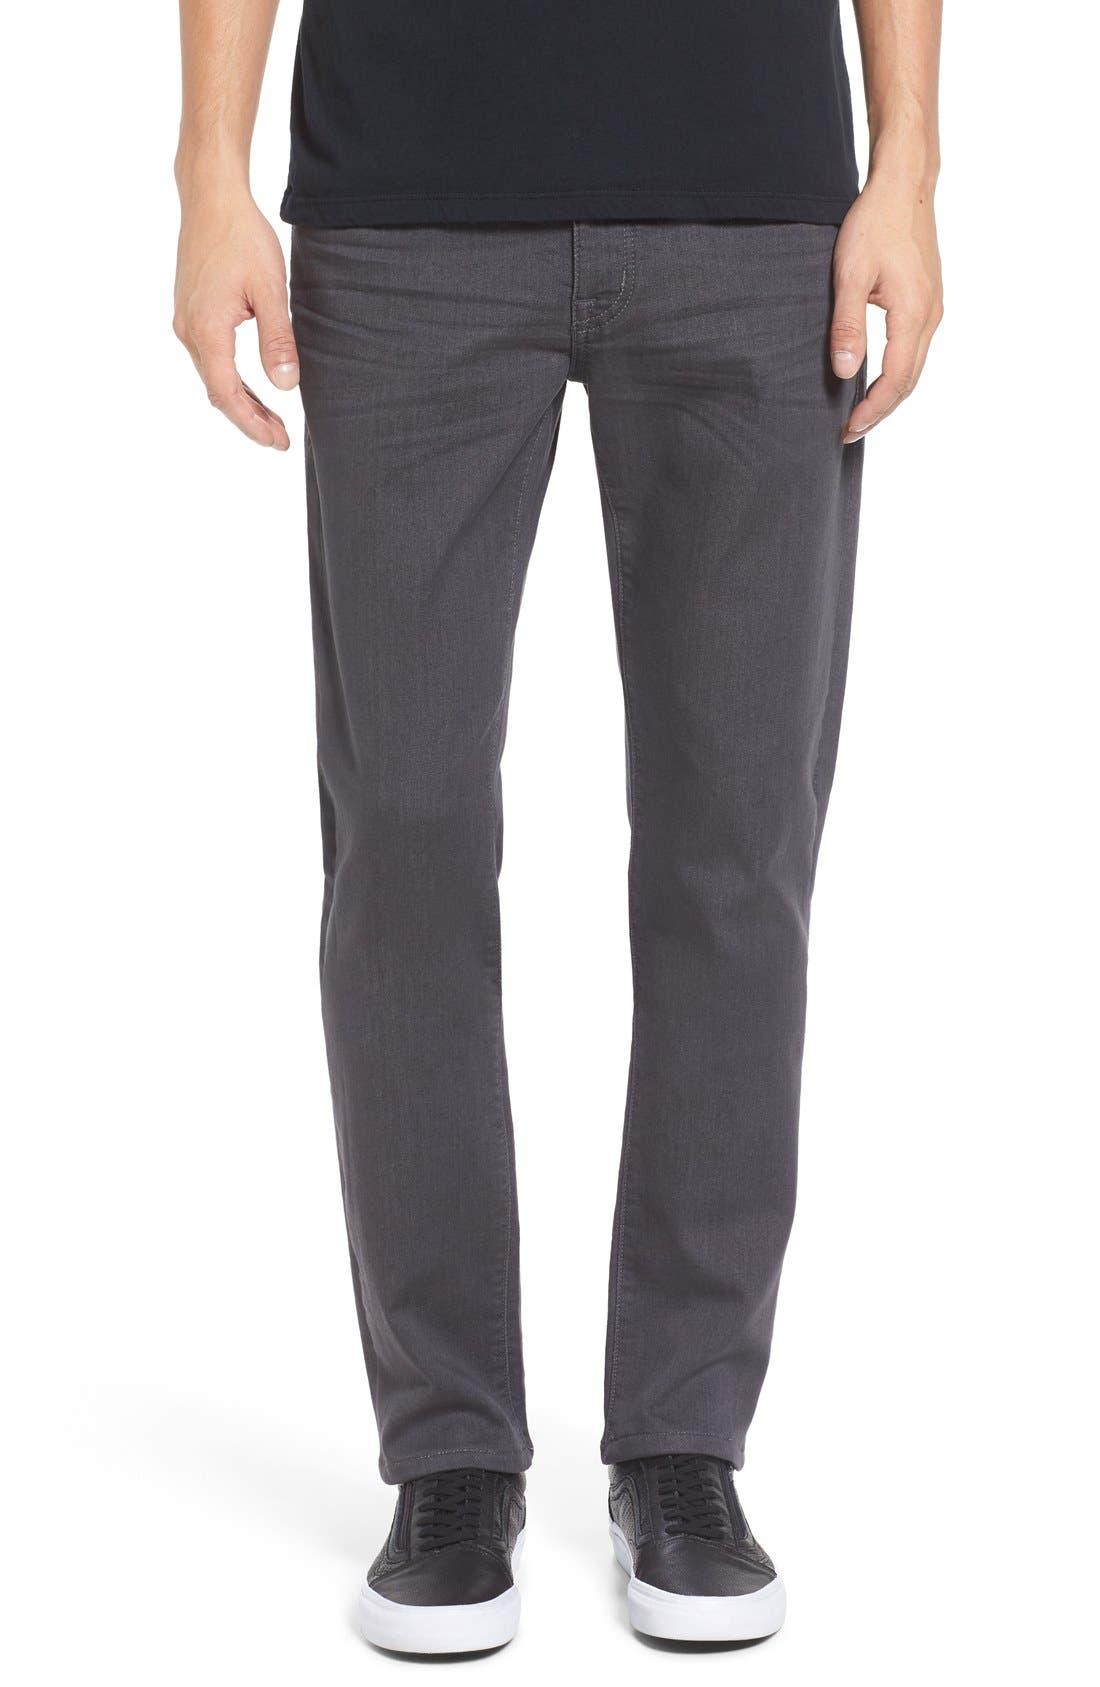 Torino Slim Fit Jeans,                             Main thumbnail 1, color,                             Fox Grey